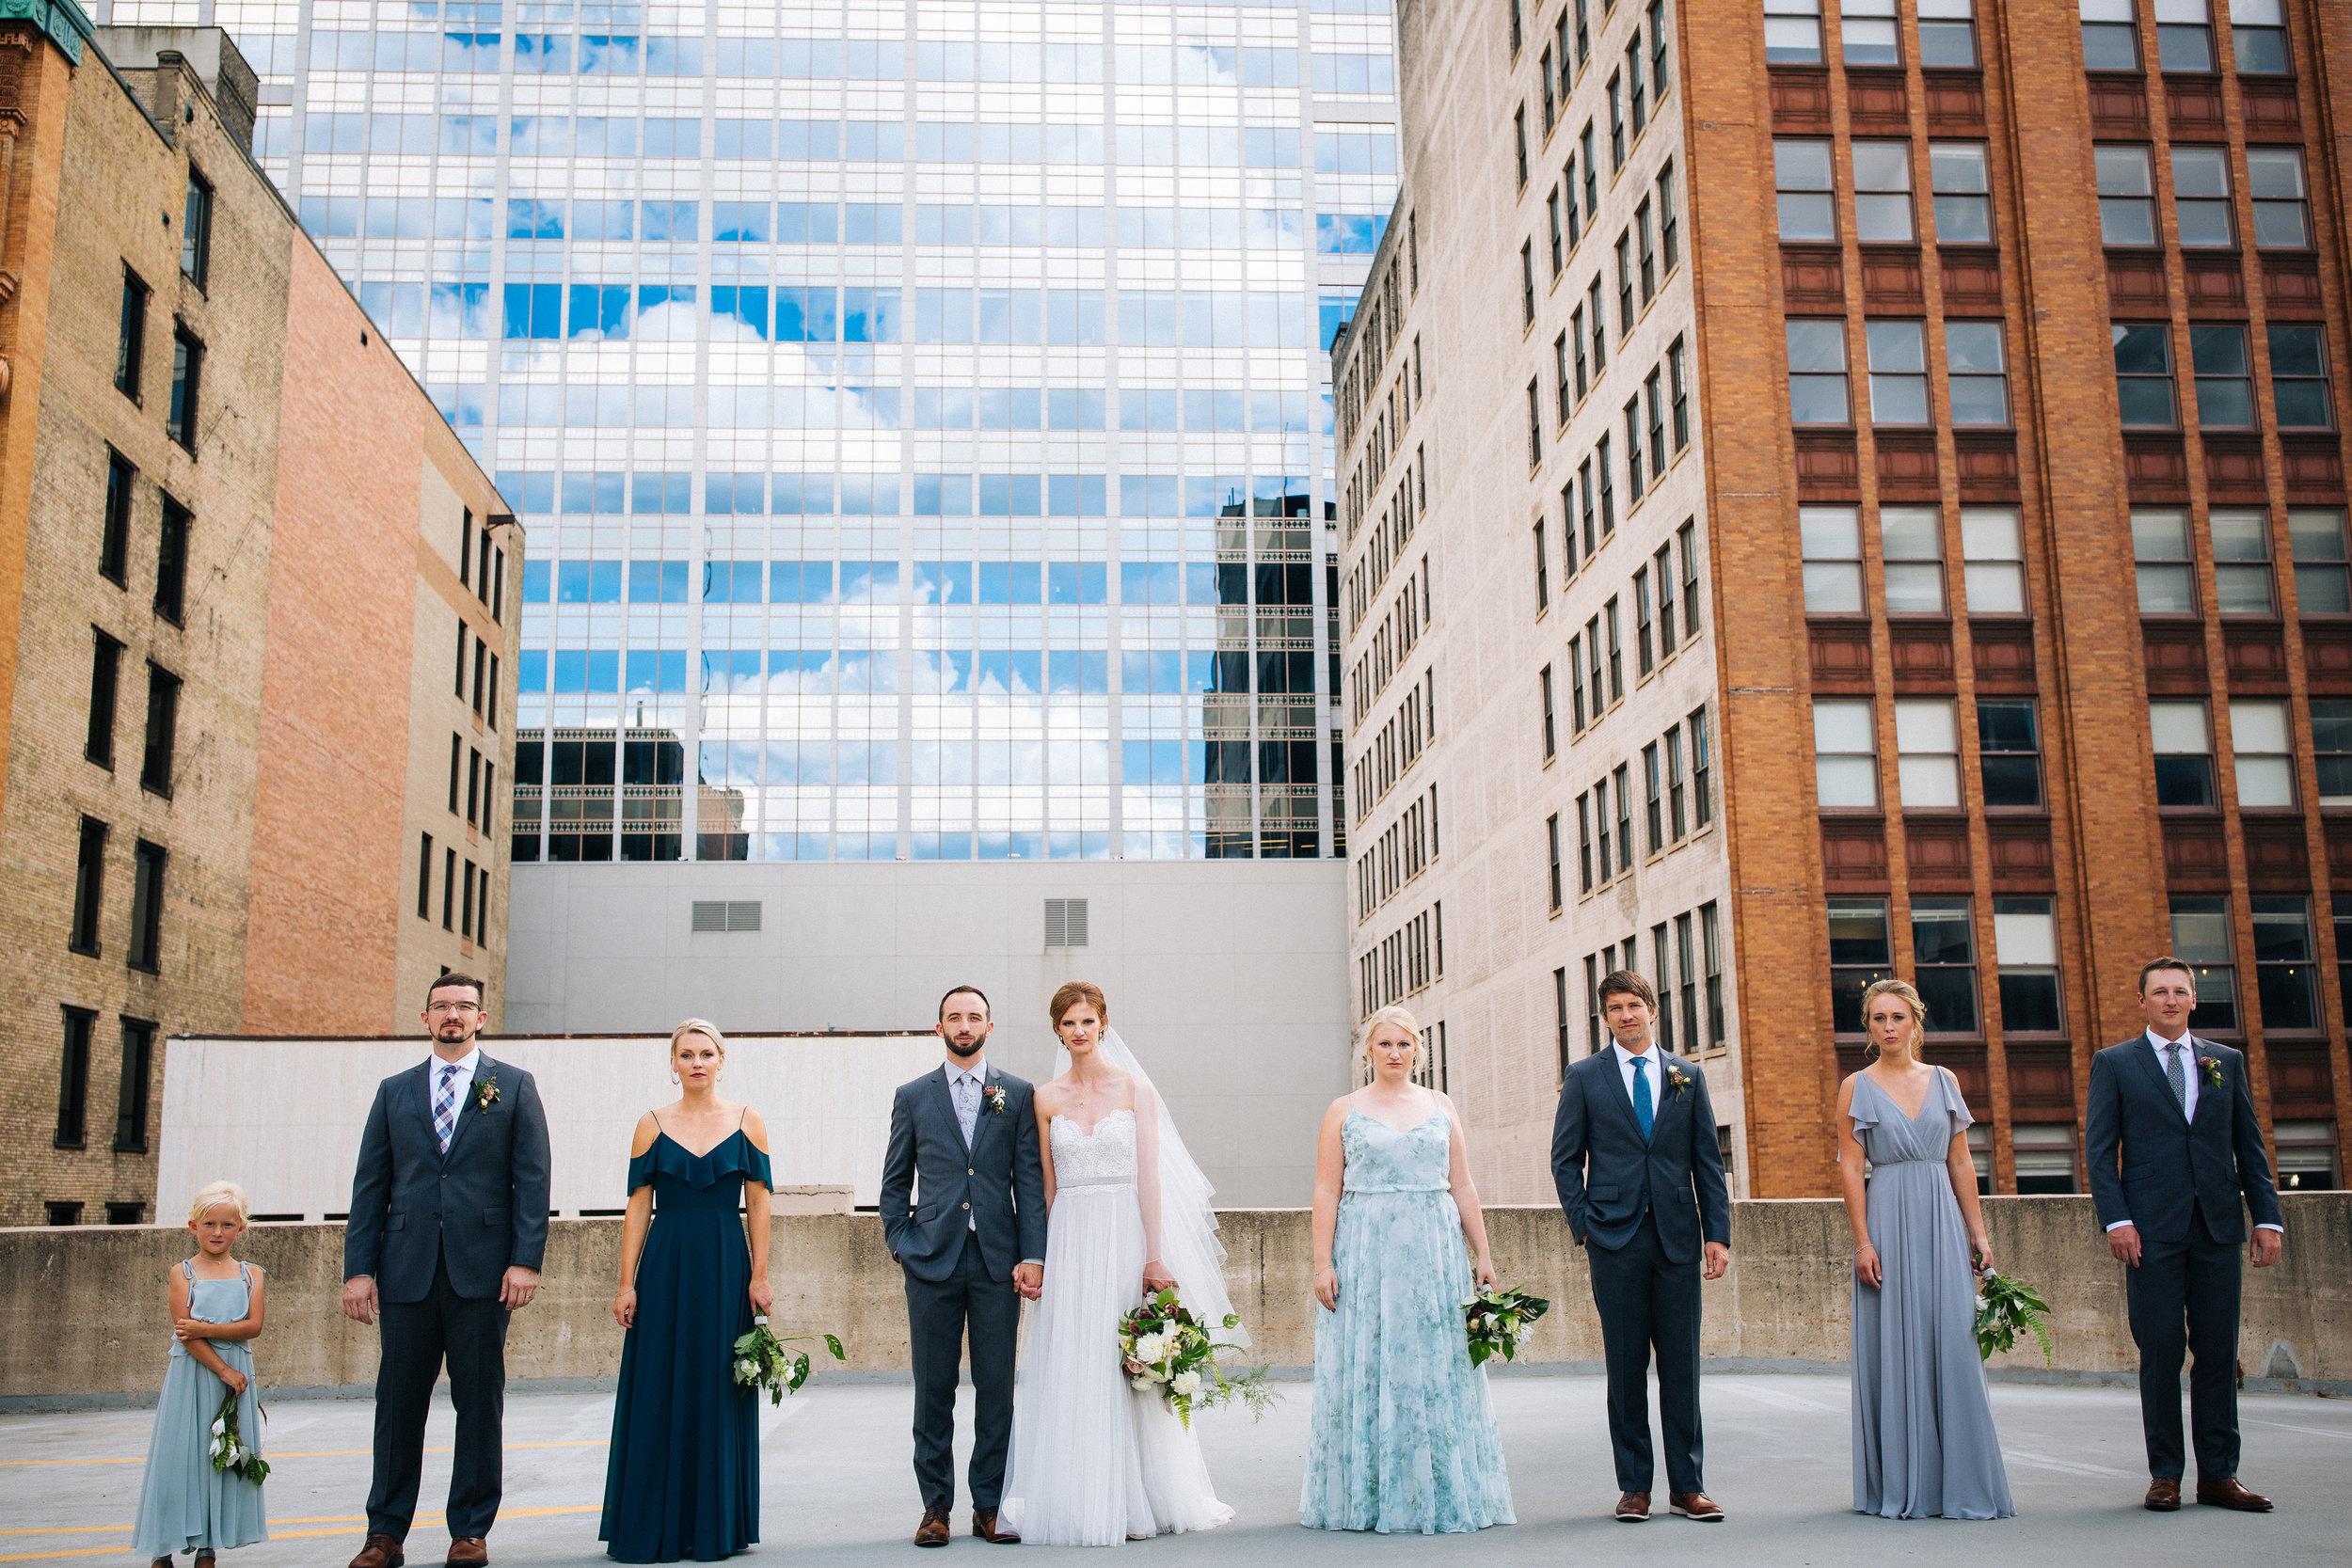 Minneapolis Rooftop wedding photos